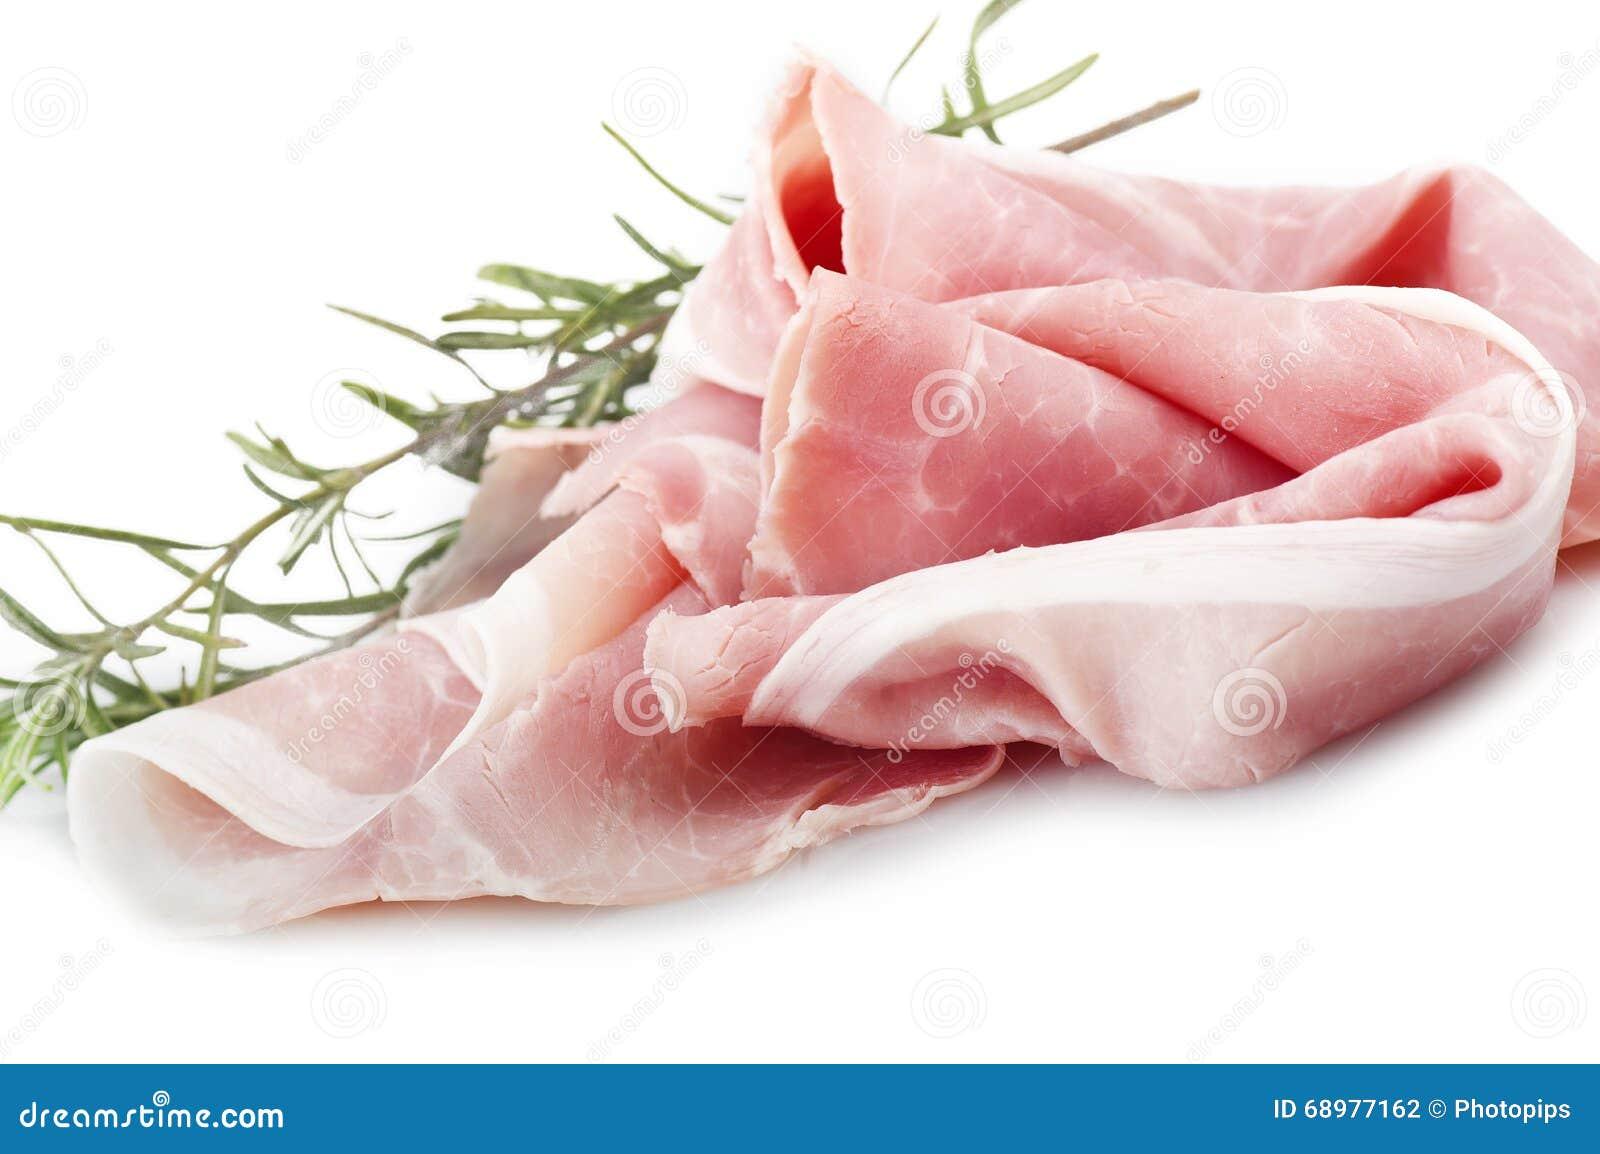 Tranches de jambon de porc